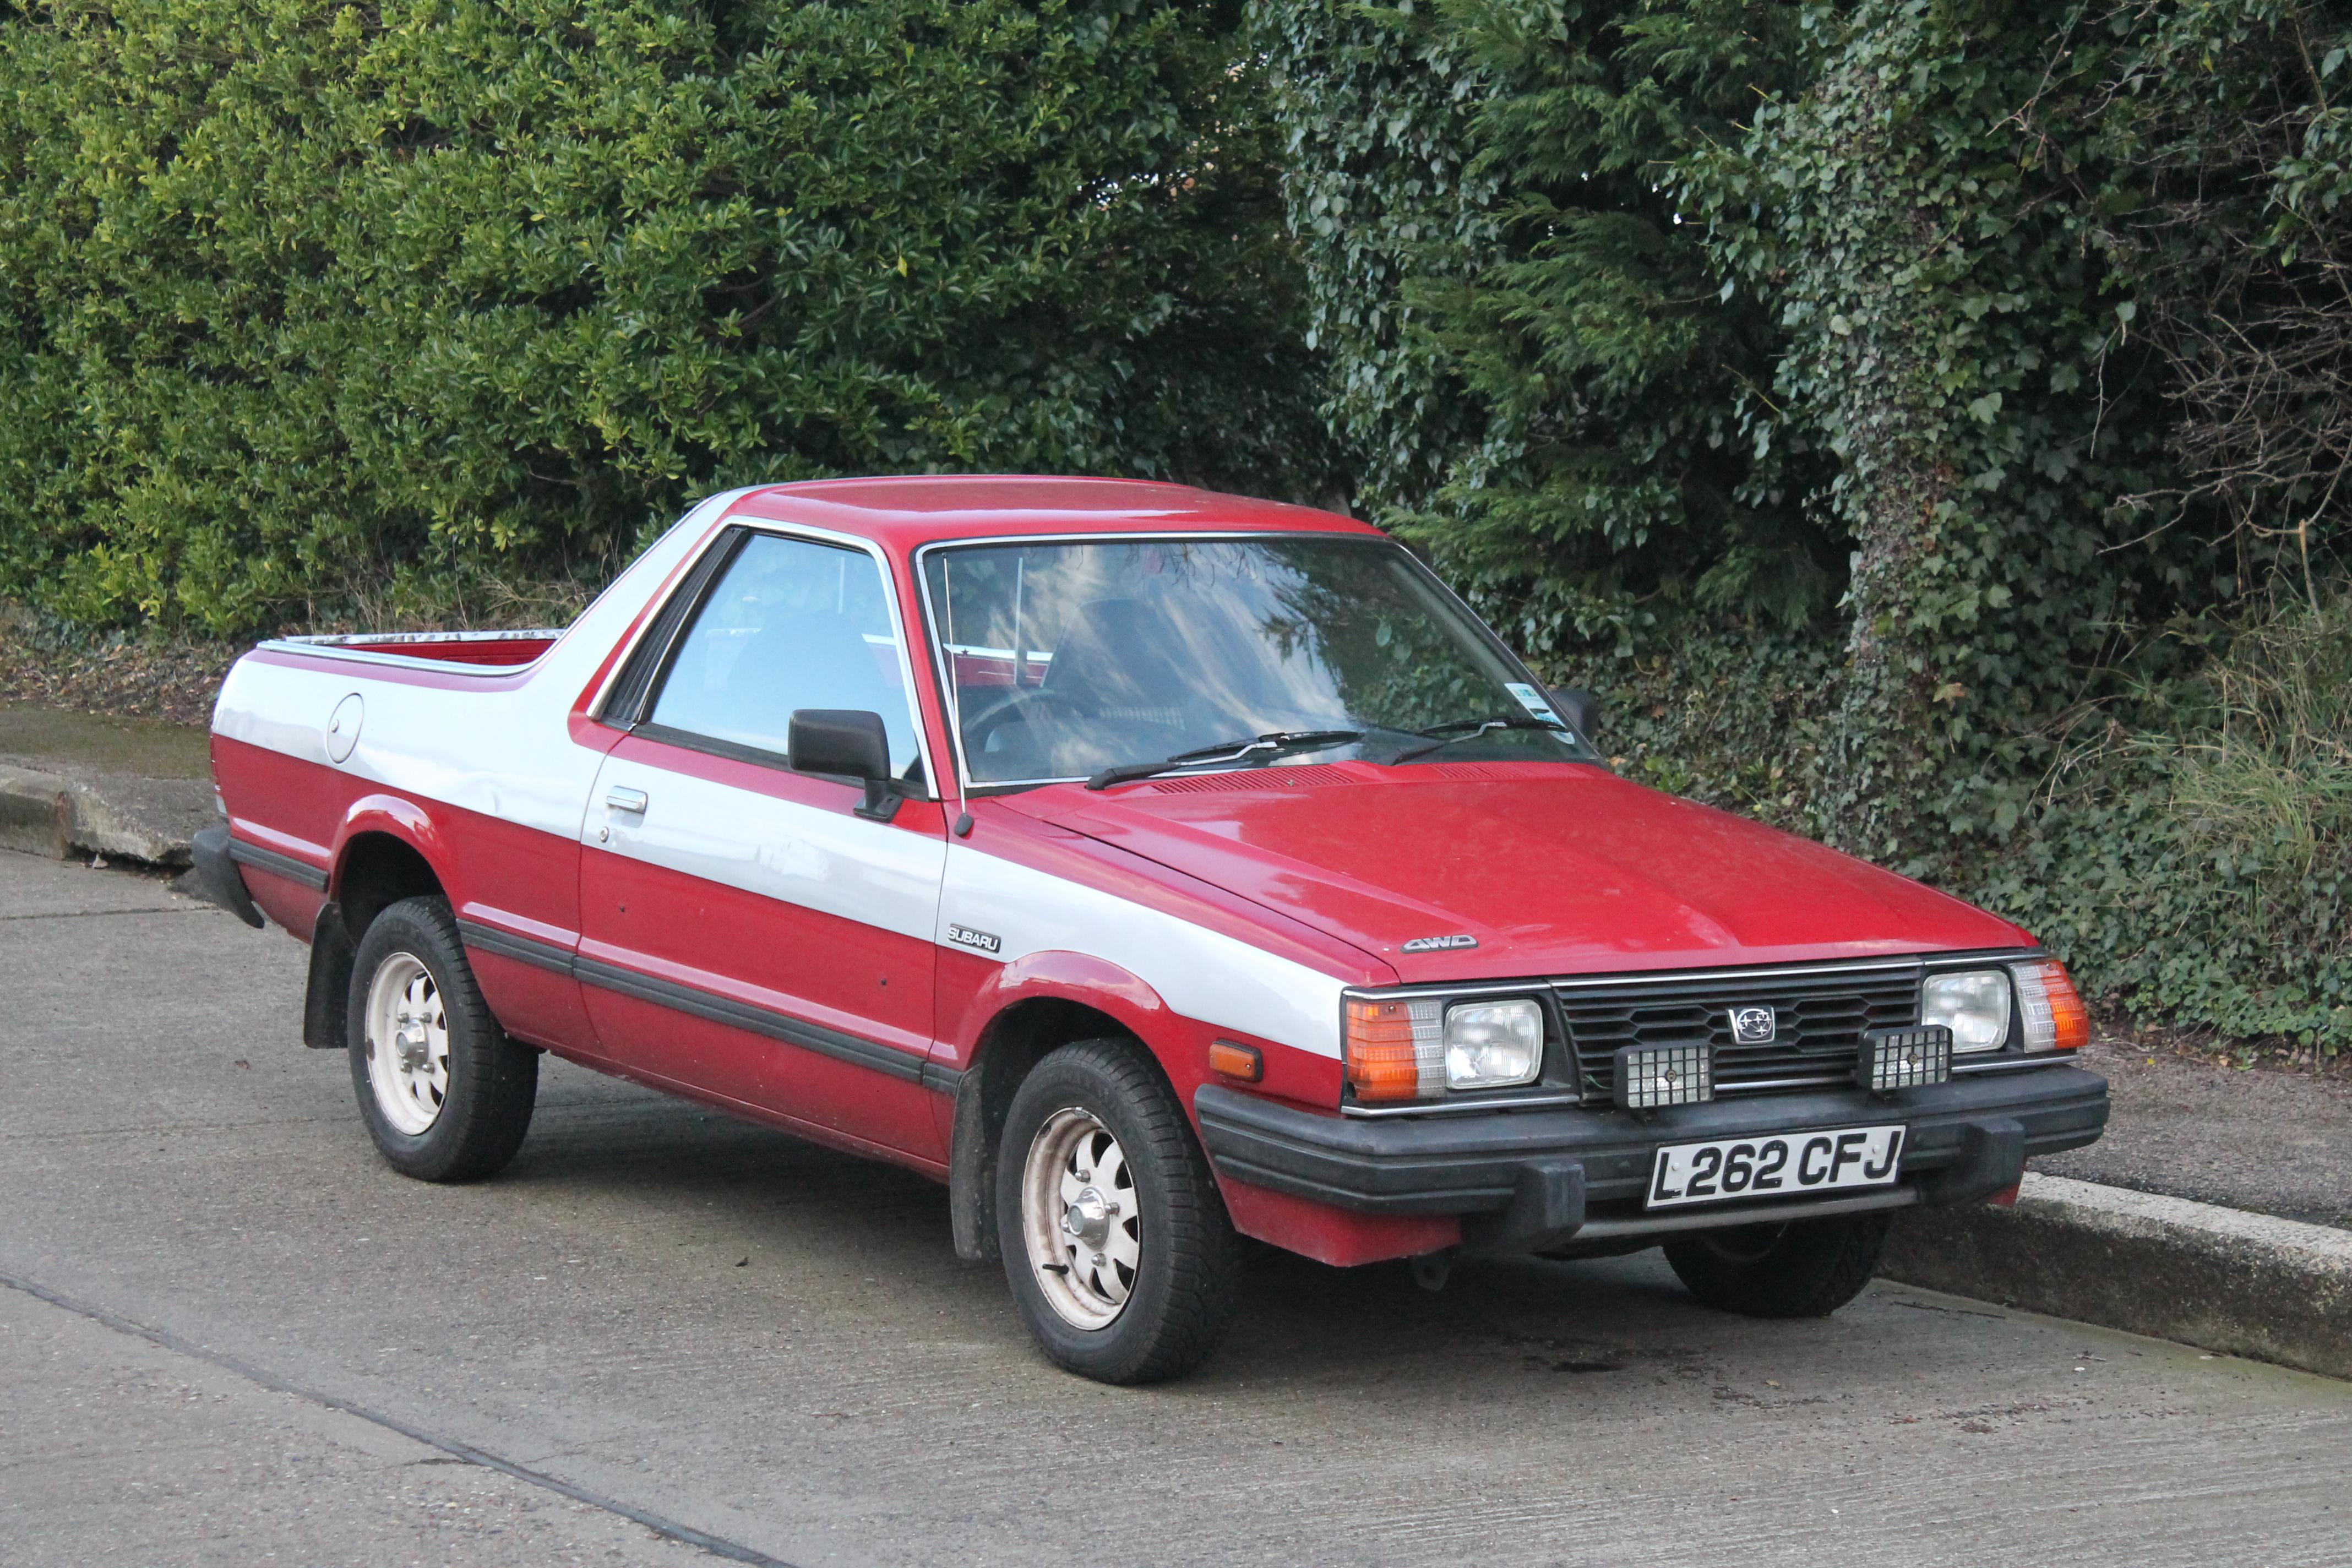 1994_Subaru_284_4WD_pickup_BRAT_(15958639684).jpg